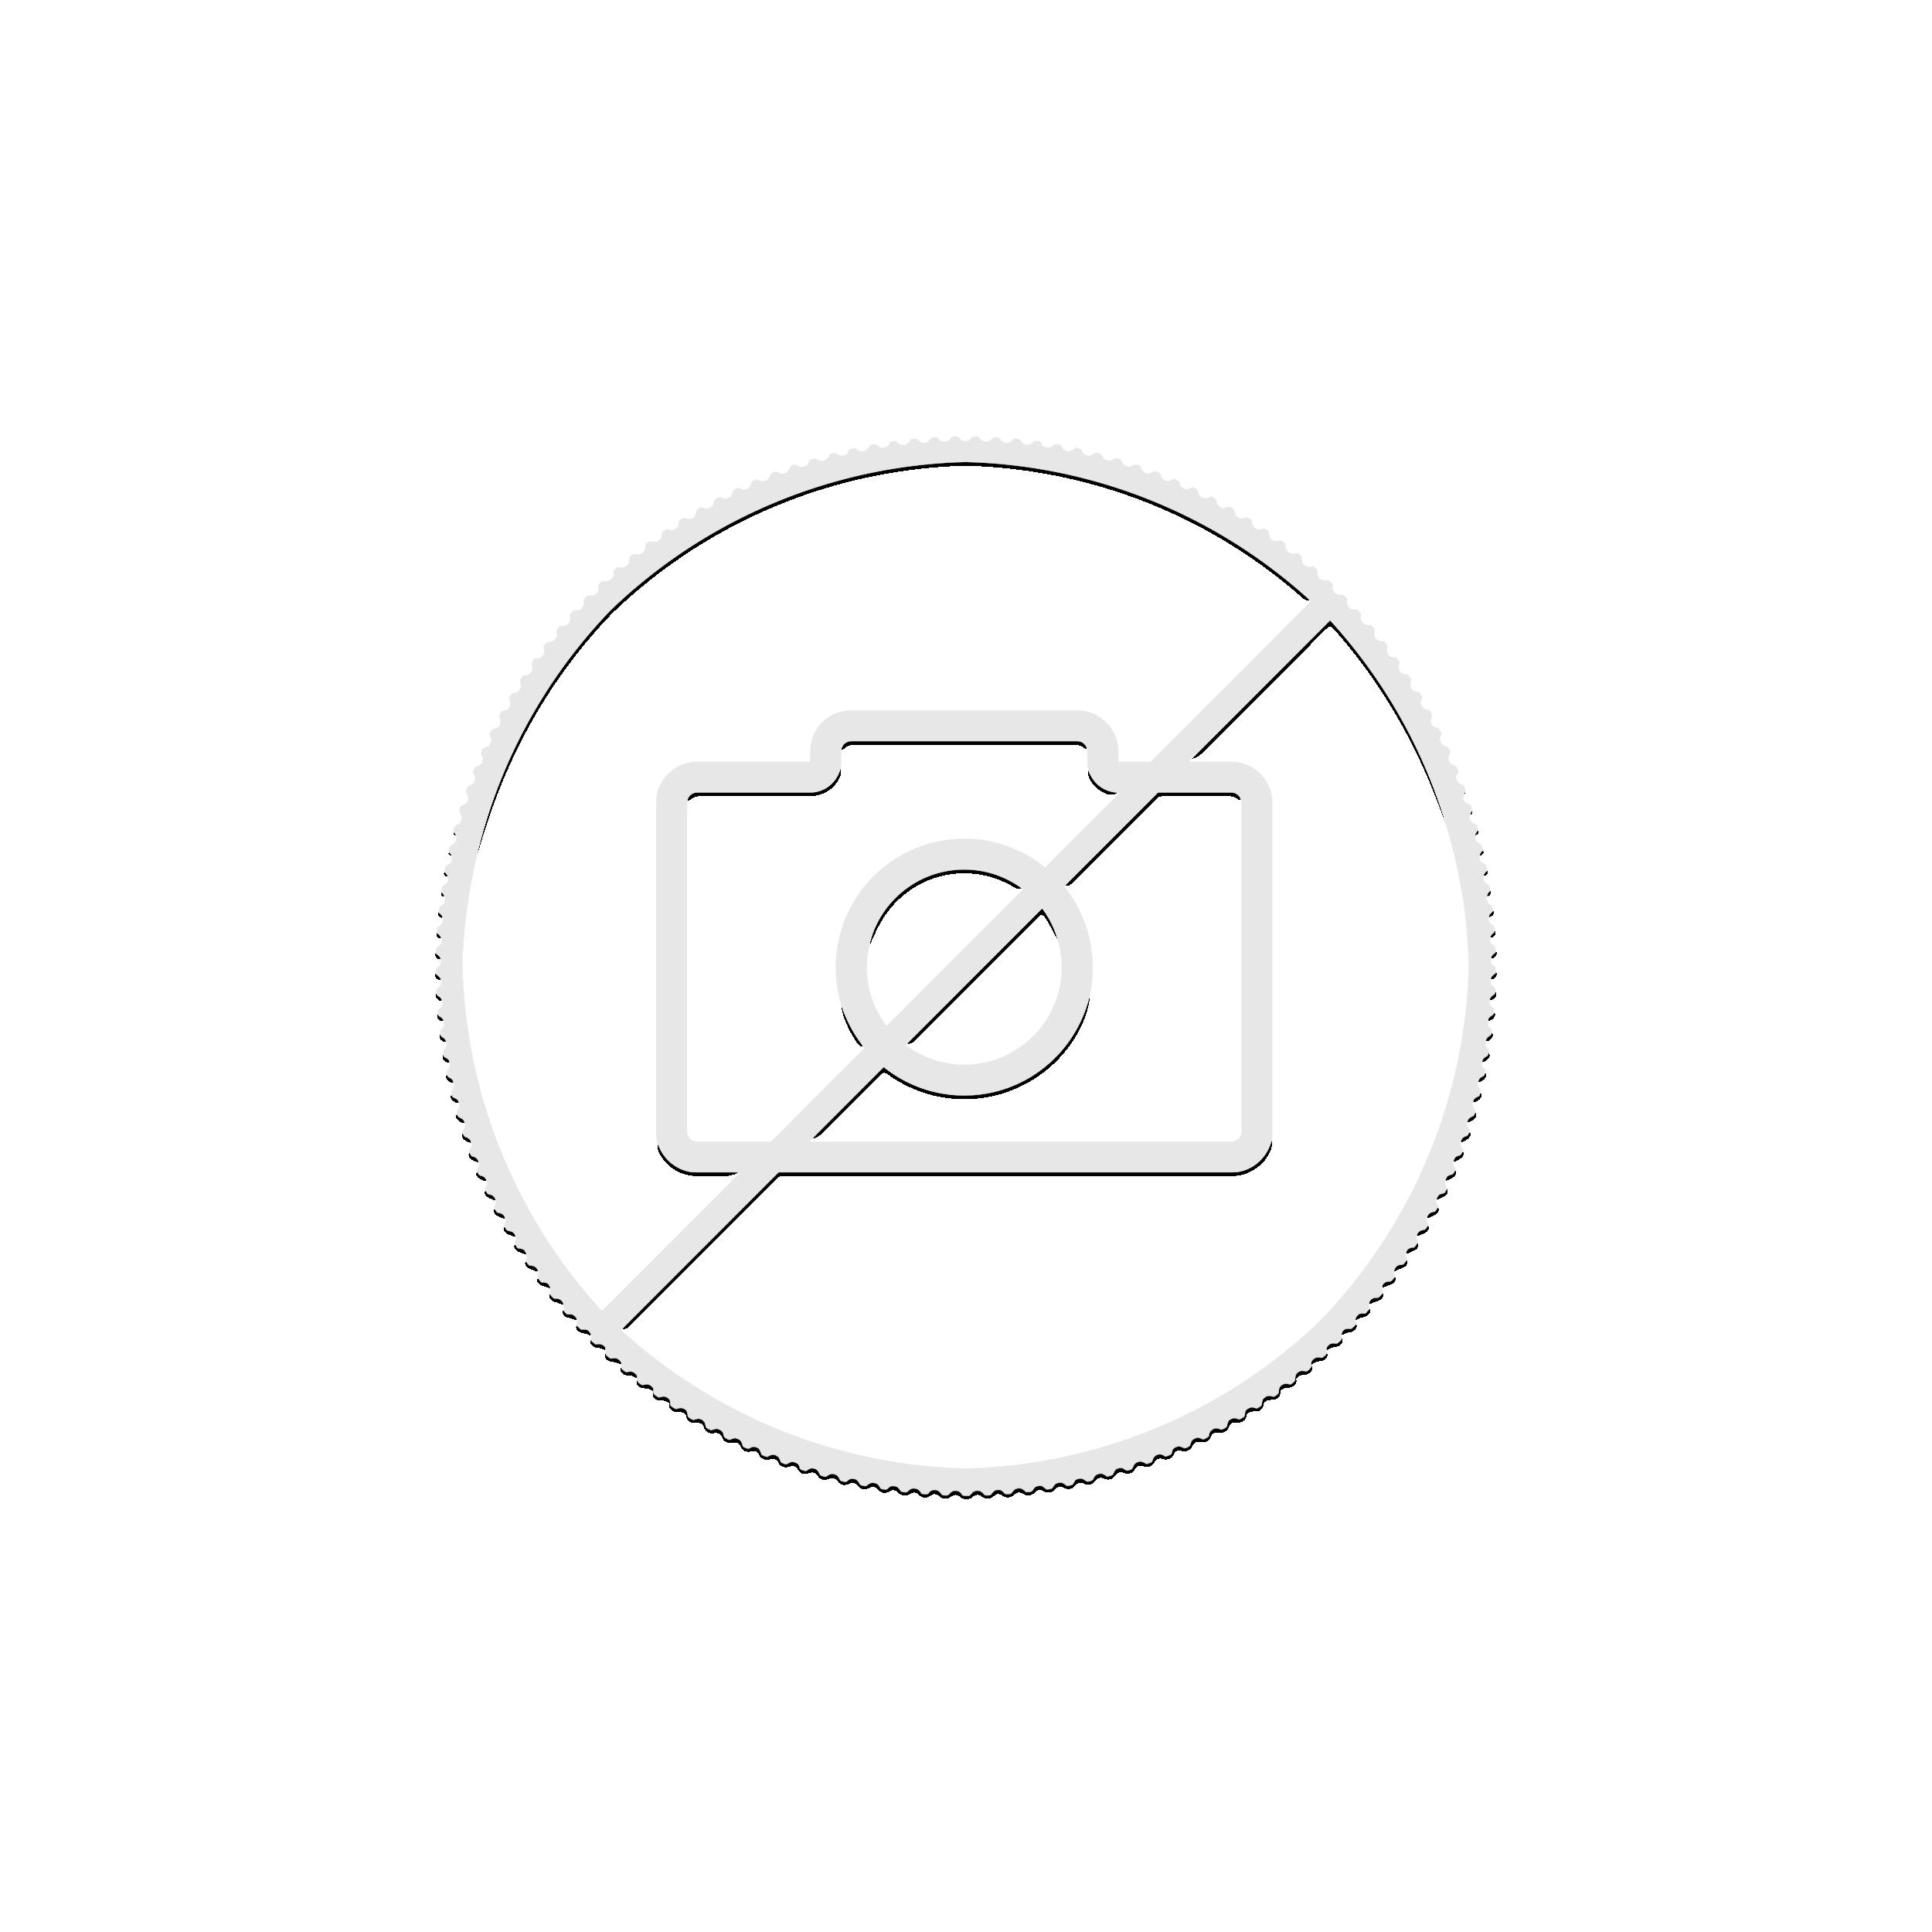 10 troy ounce zilver Kookaburra munt 2010